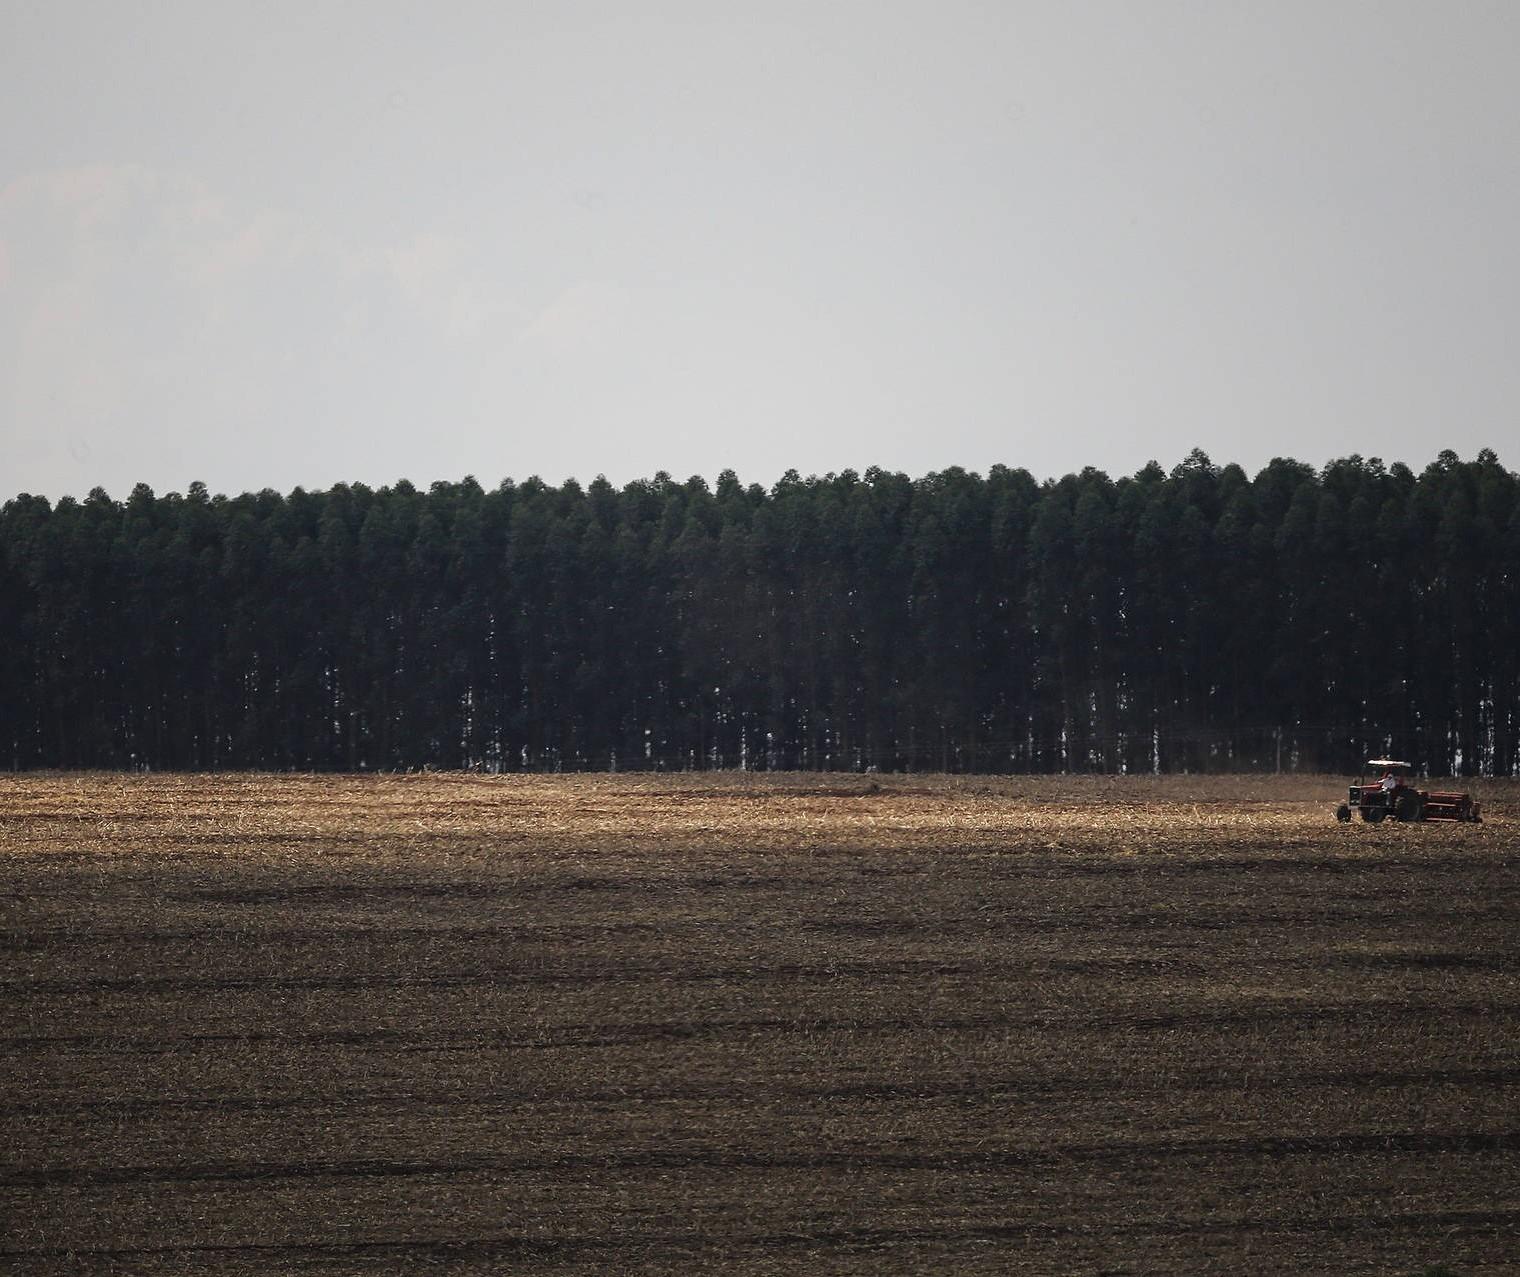 Agricultores iniciam preparo de solo visando a safra 2021/2022